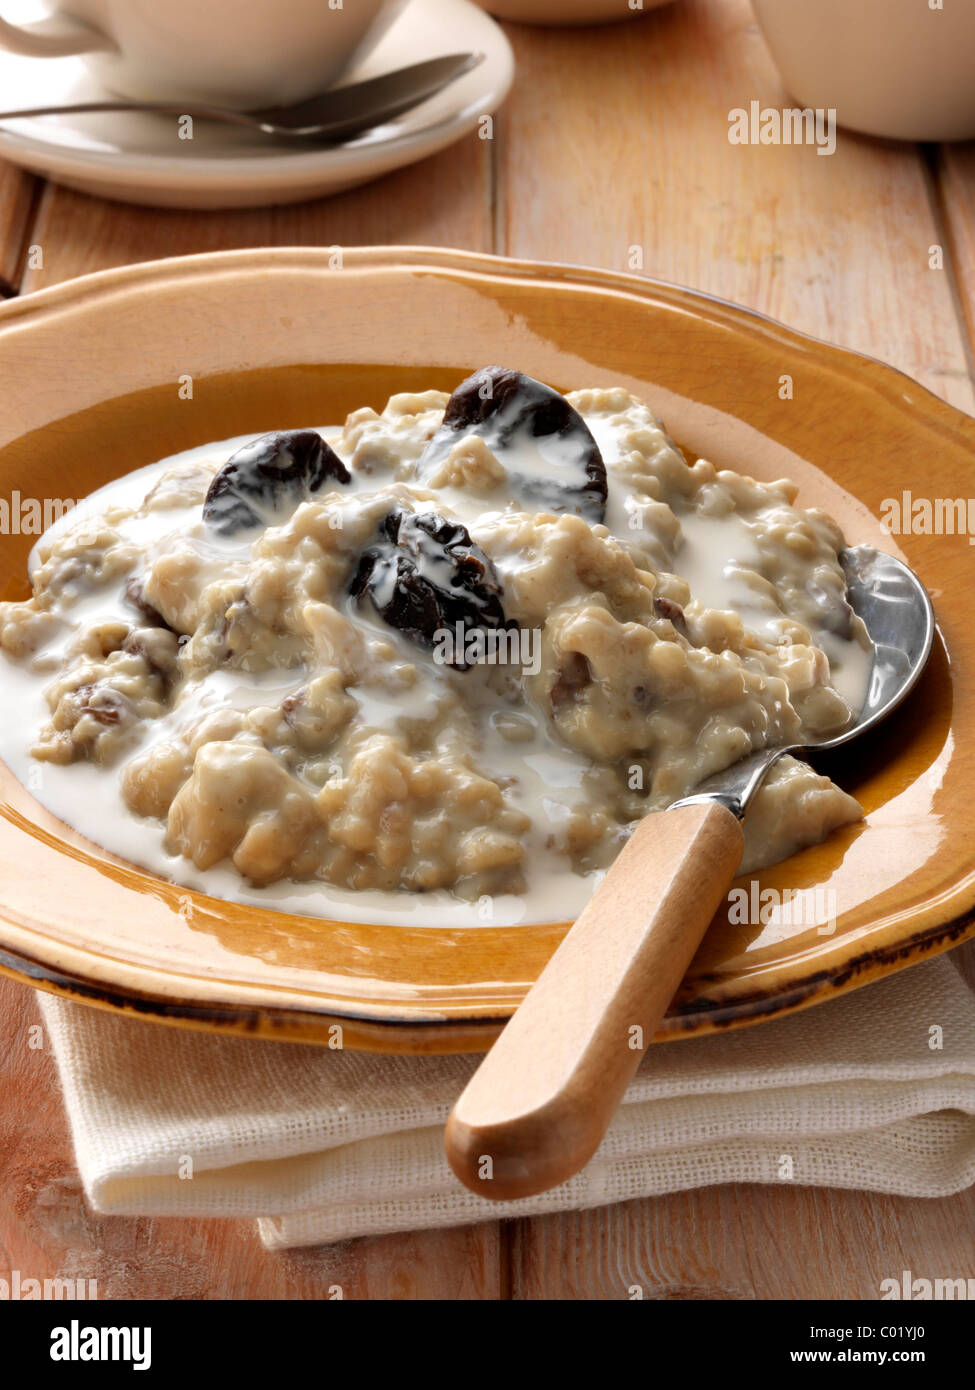 Individual portion of porridge and fruit vegetarian breakfast - Stock Image